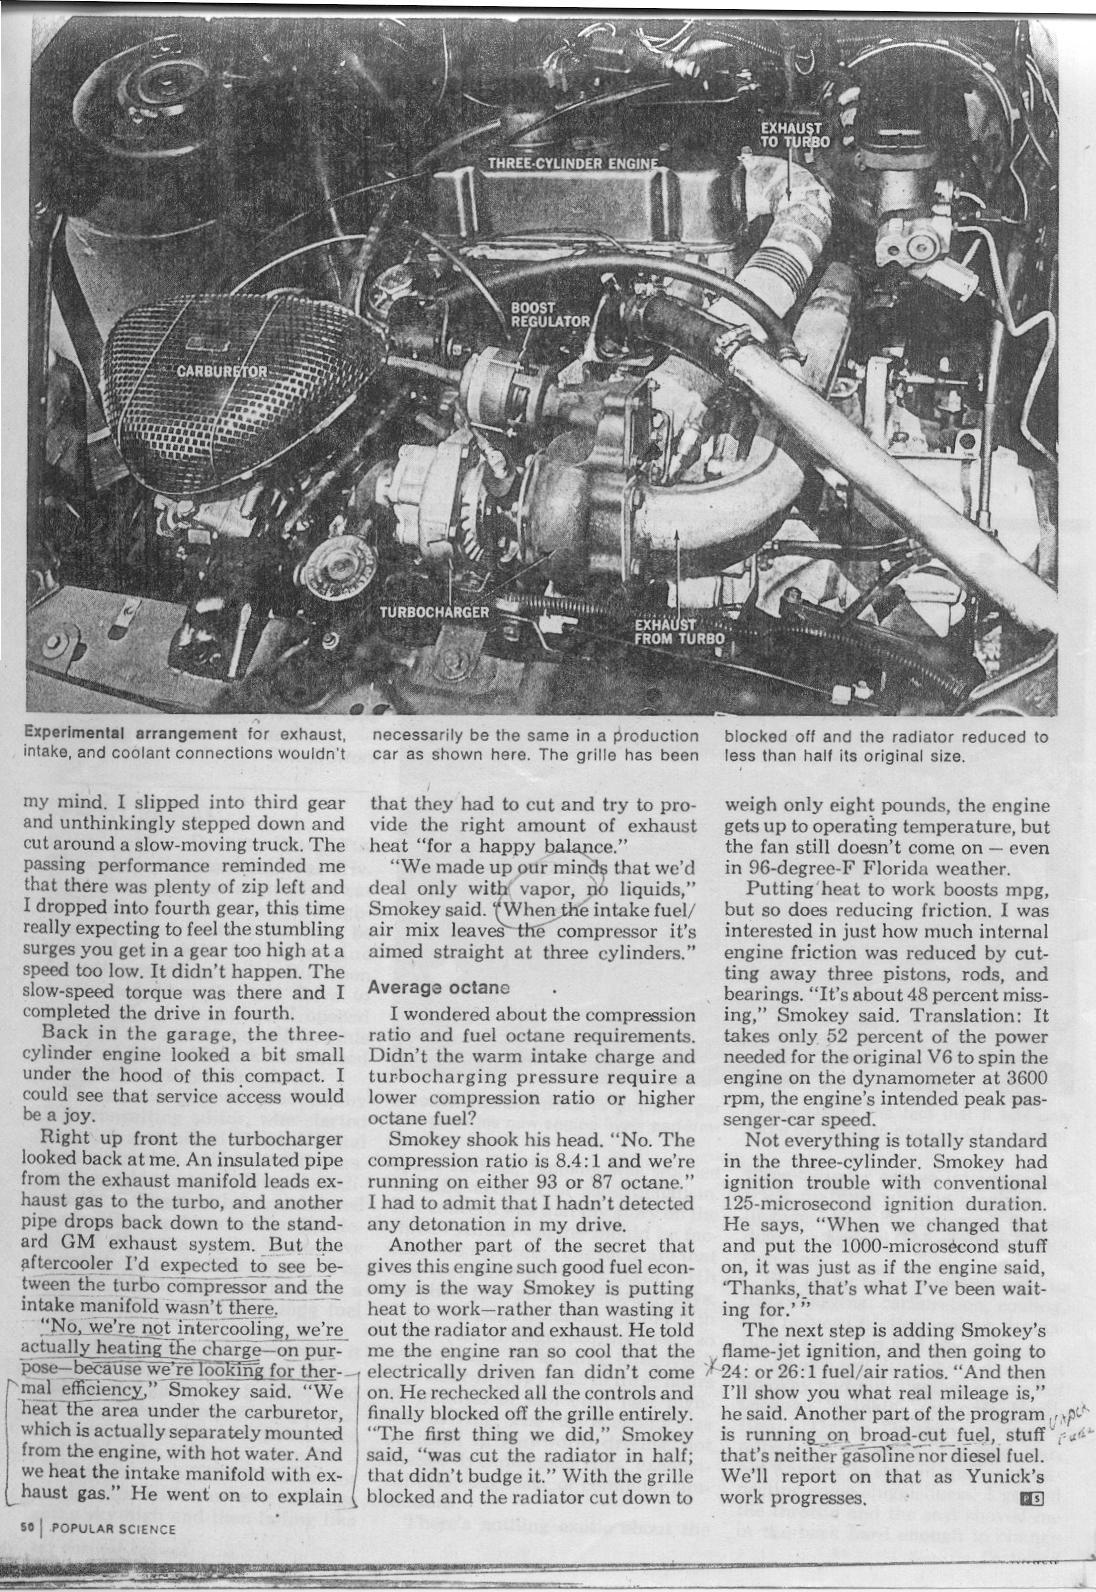 1969 cougar classic car restoration by doug jenkins garage - If